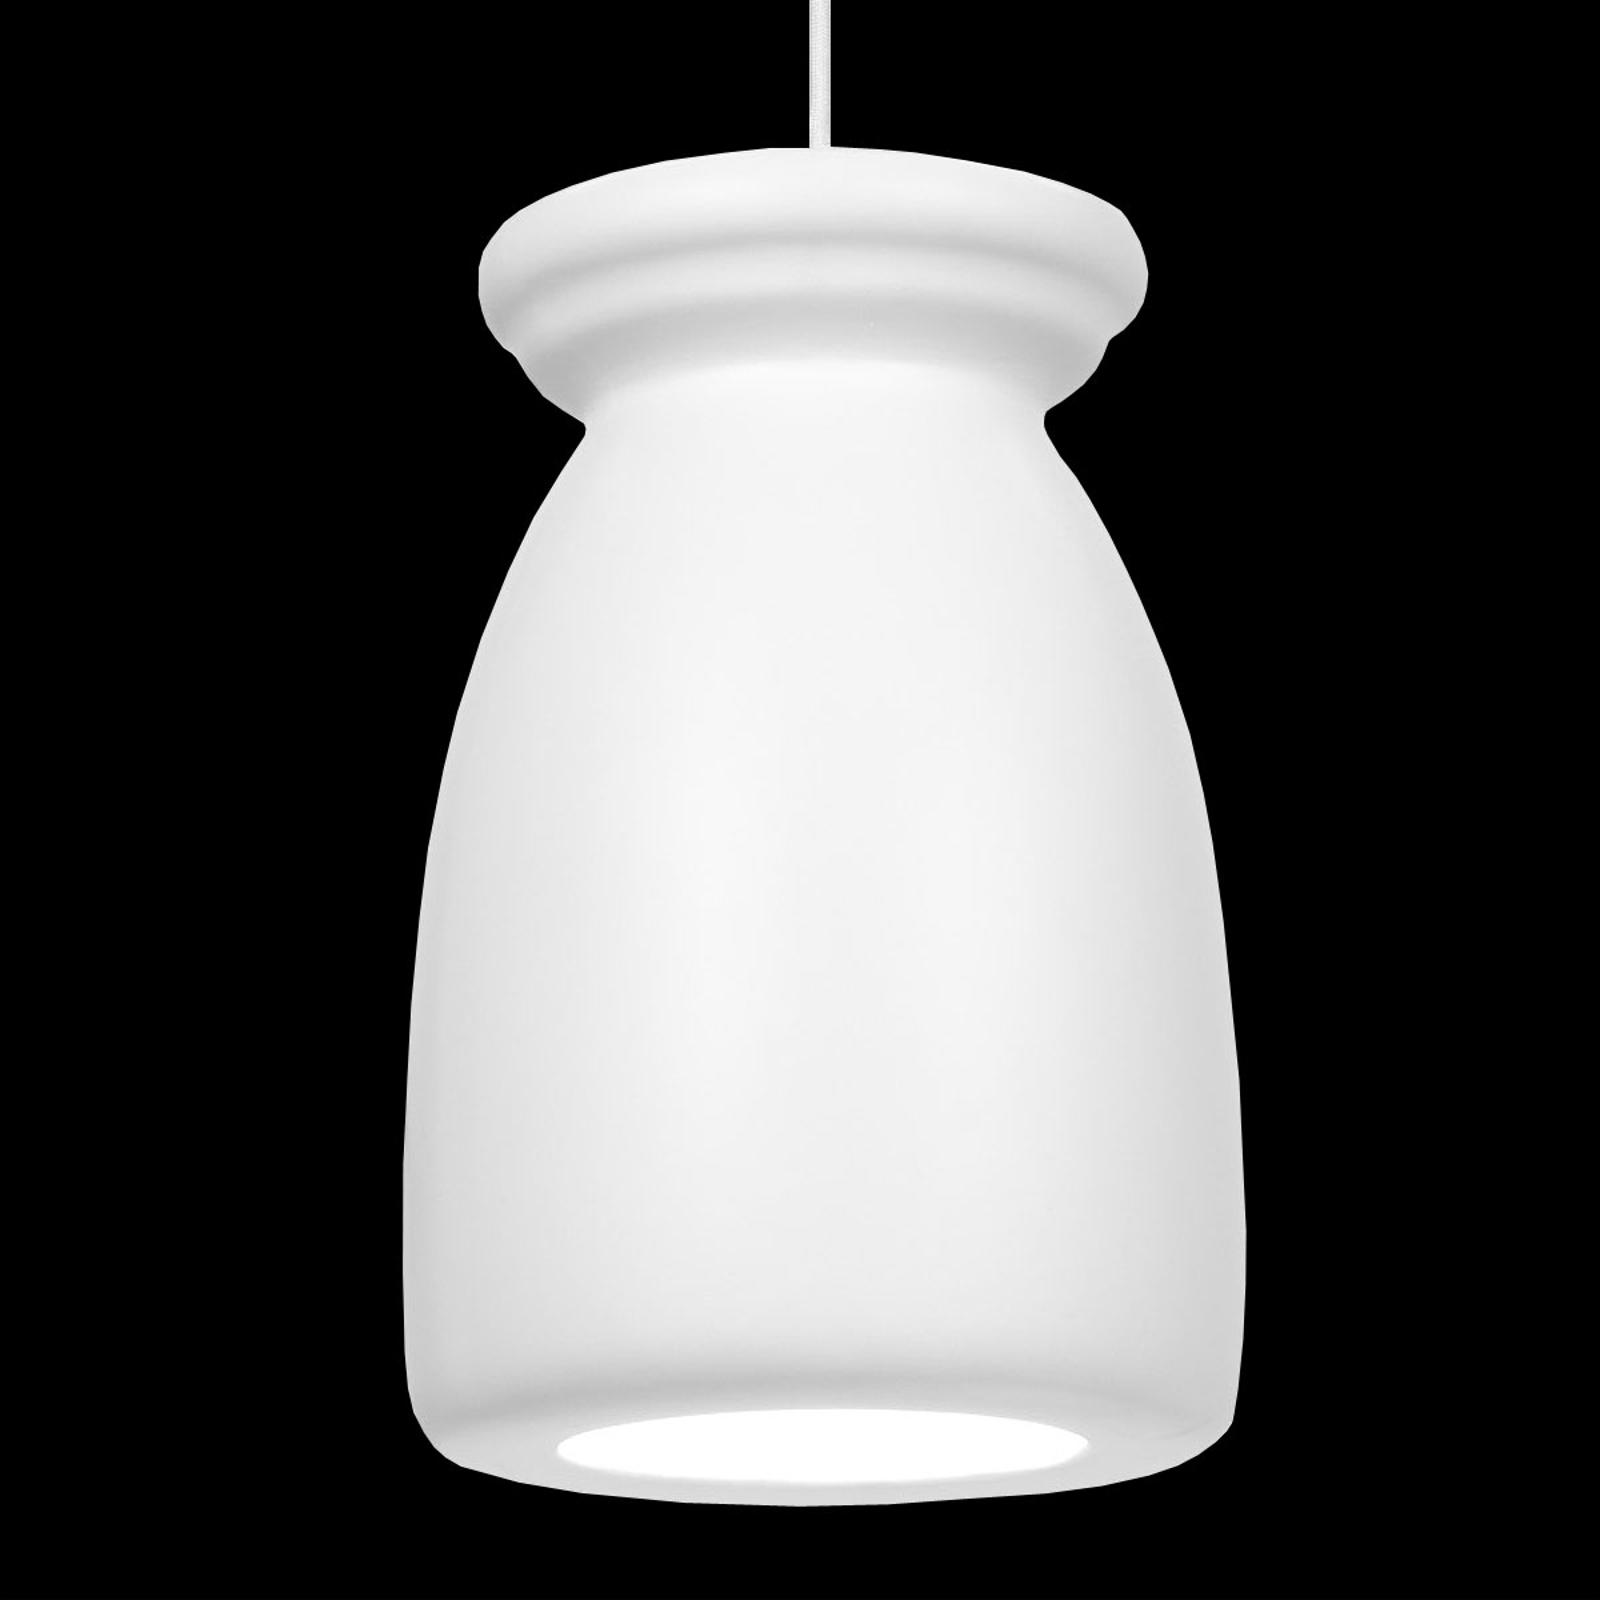 Falista lampa wisząca Biscuit jakość designerska